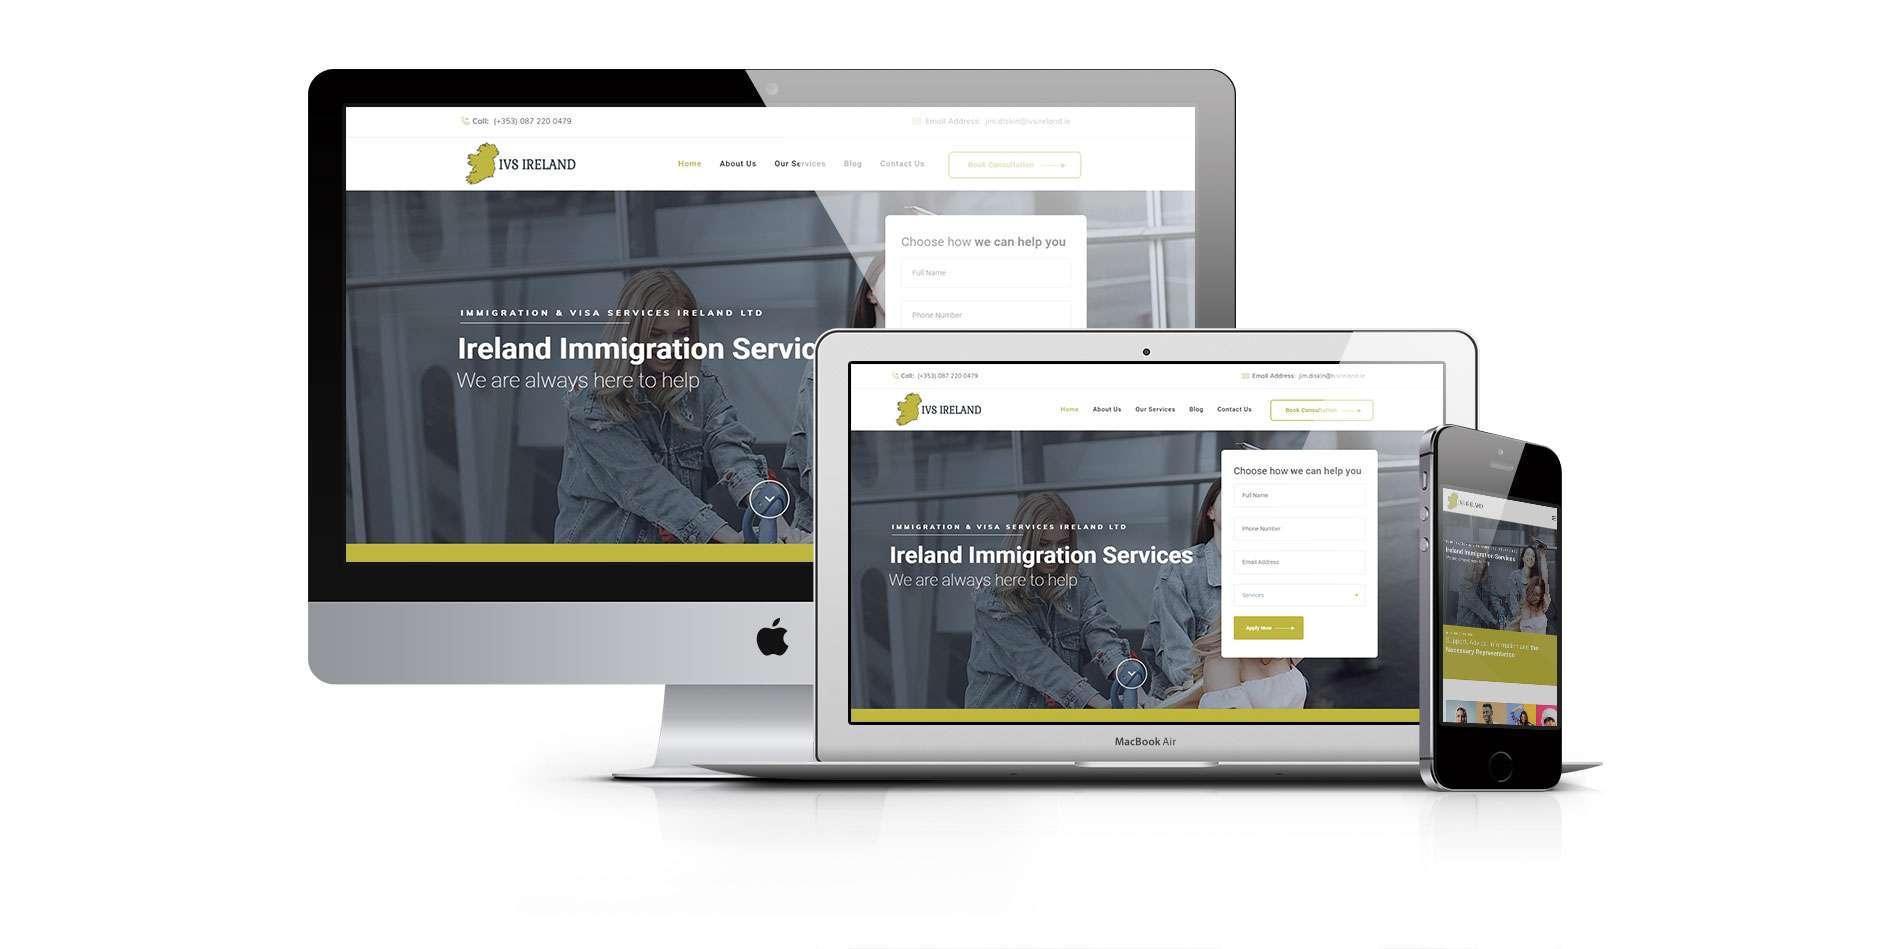 ivs ireland featured image - ve spoke website design by ck website design dublin